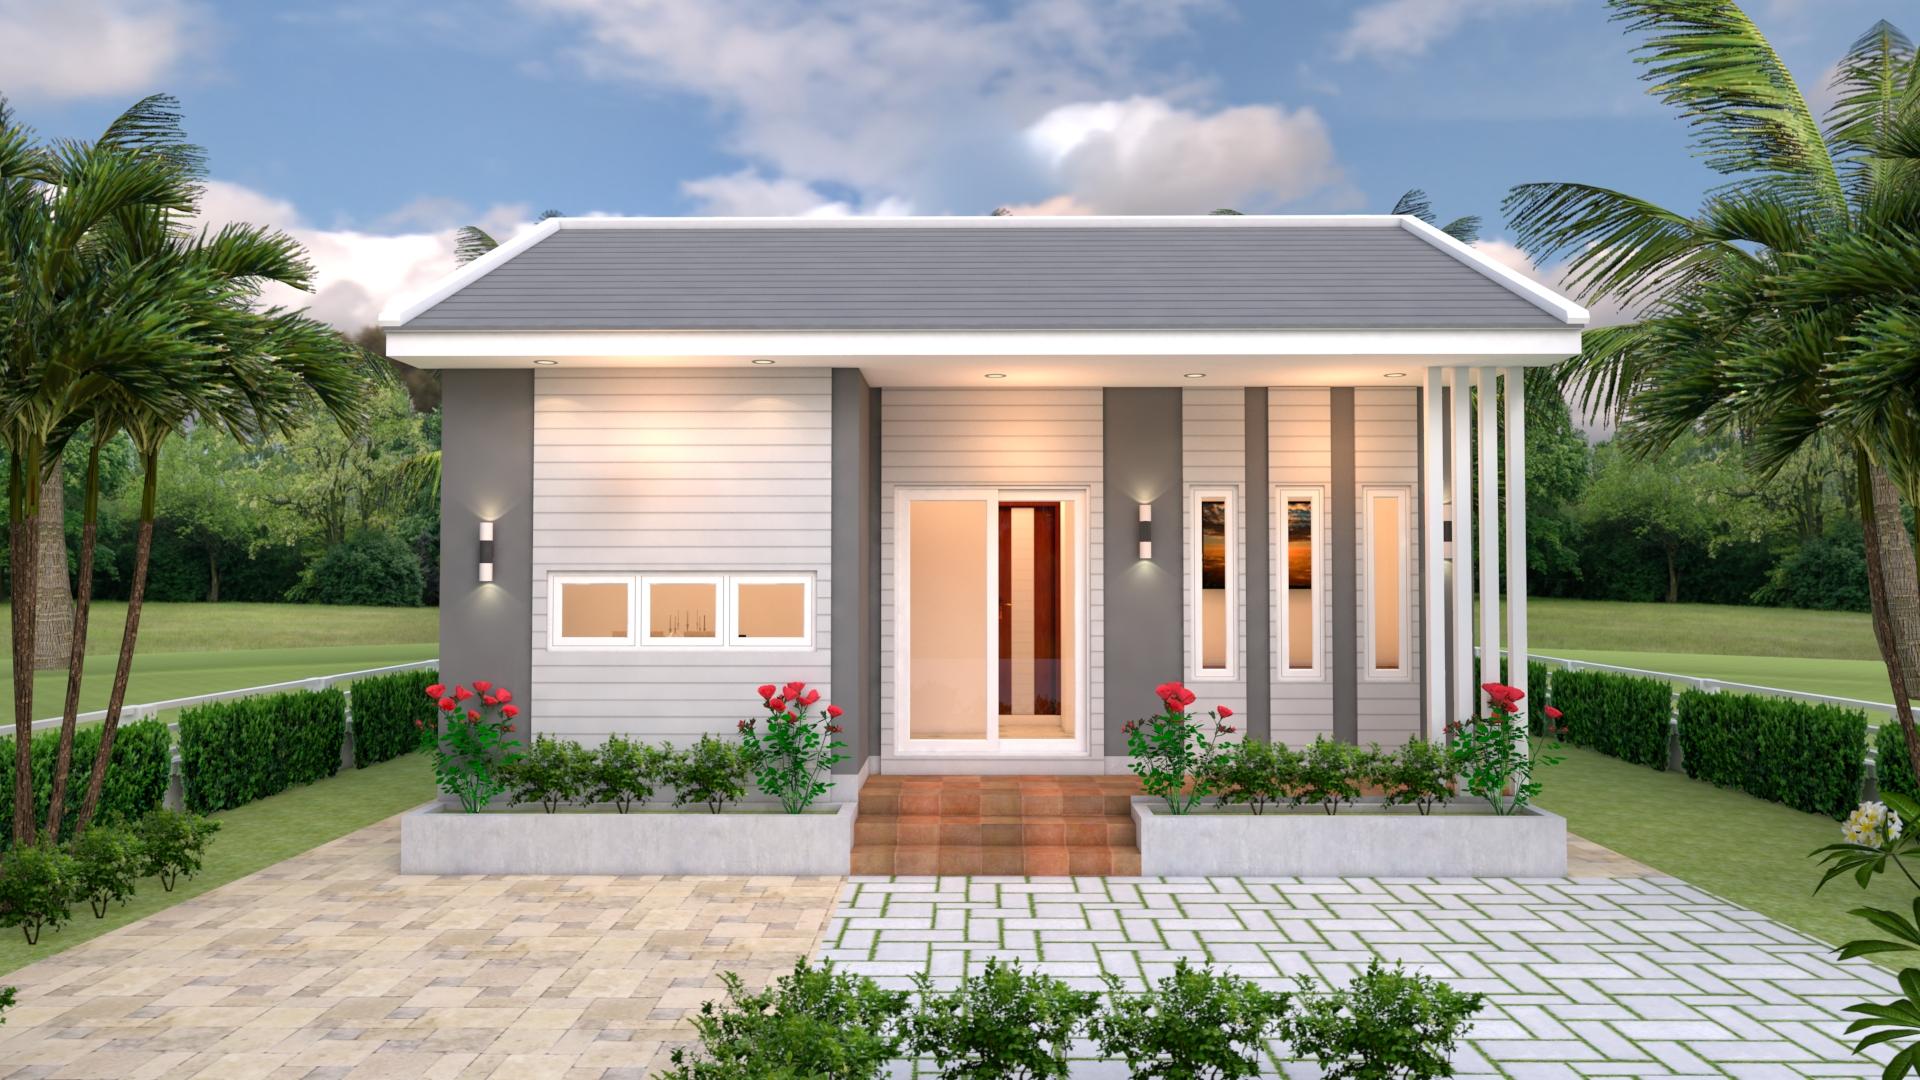 Small 2 Bedroom House 8x6 Meter 26x20 Feet 2